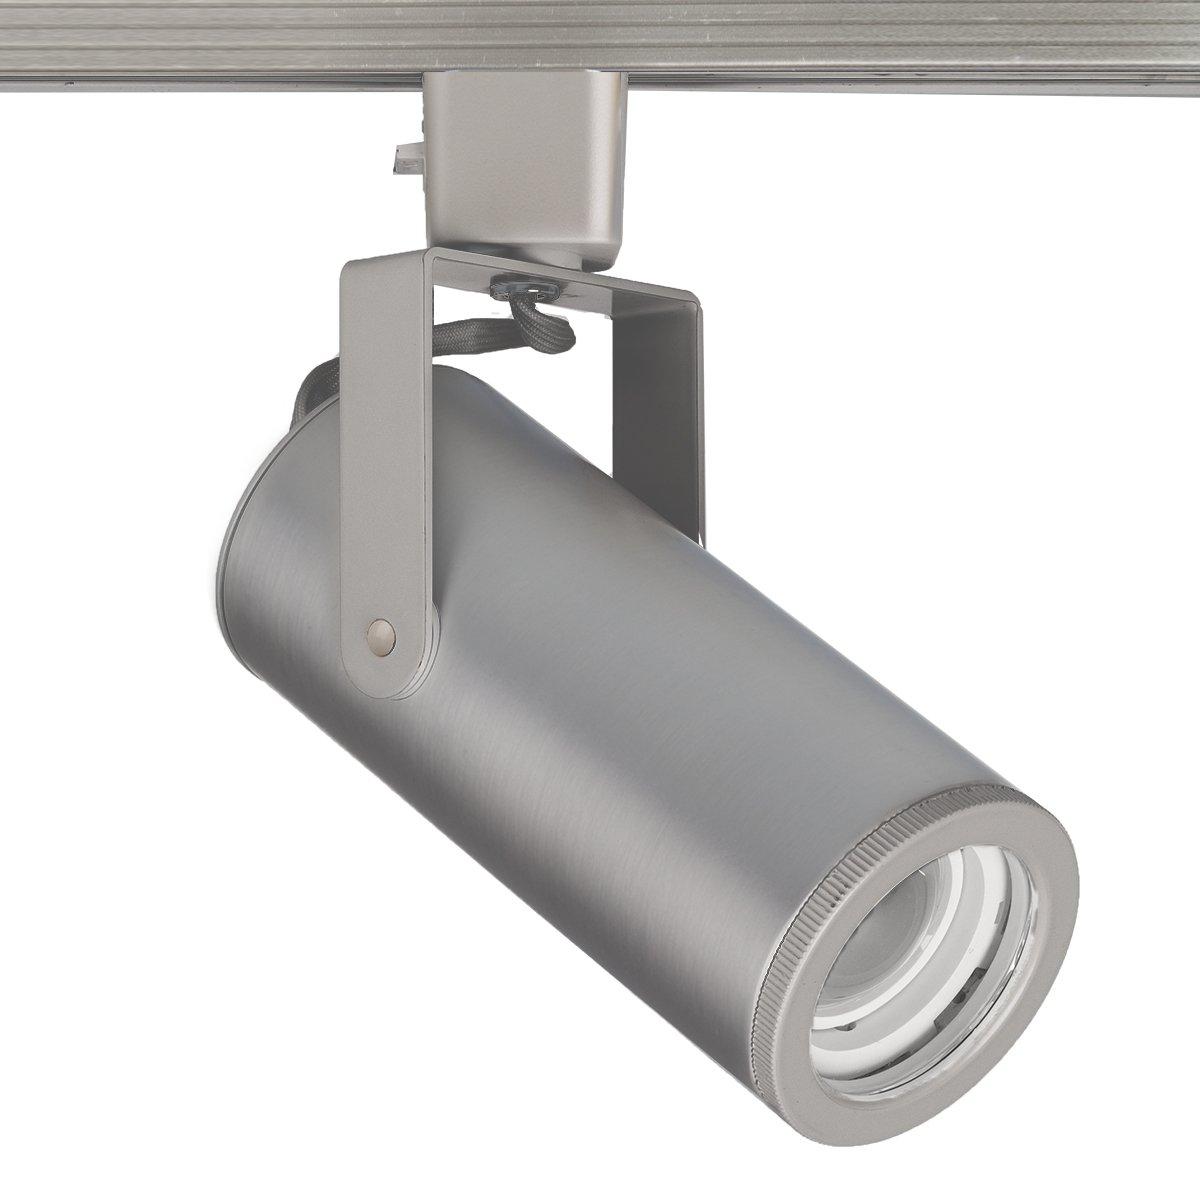 Wac lighting j 2020 935 bn led2020 silo x20 beamshift head j track fixture brushed nickel brushed nickel amazon com